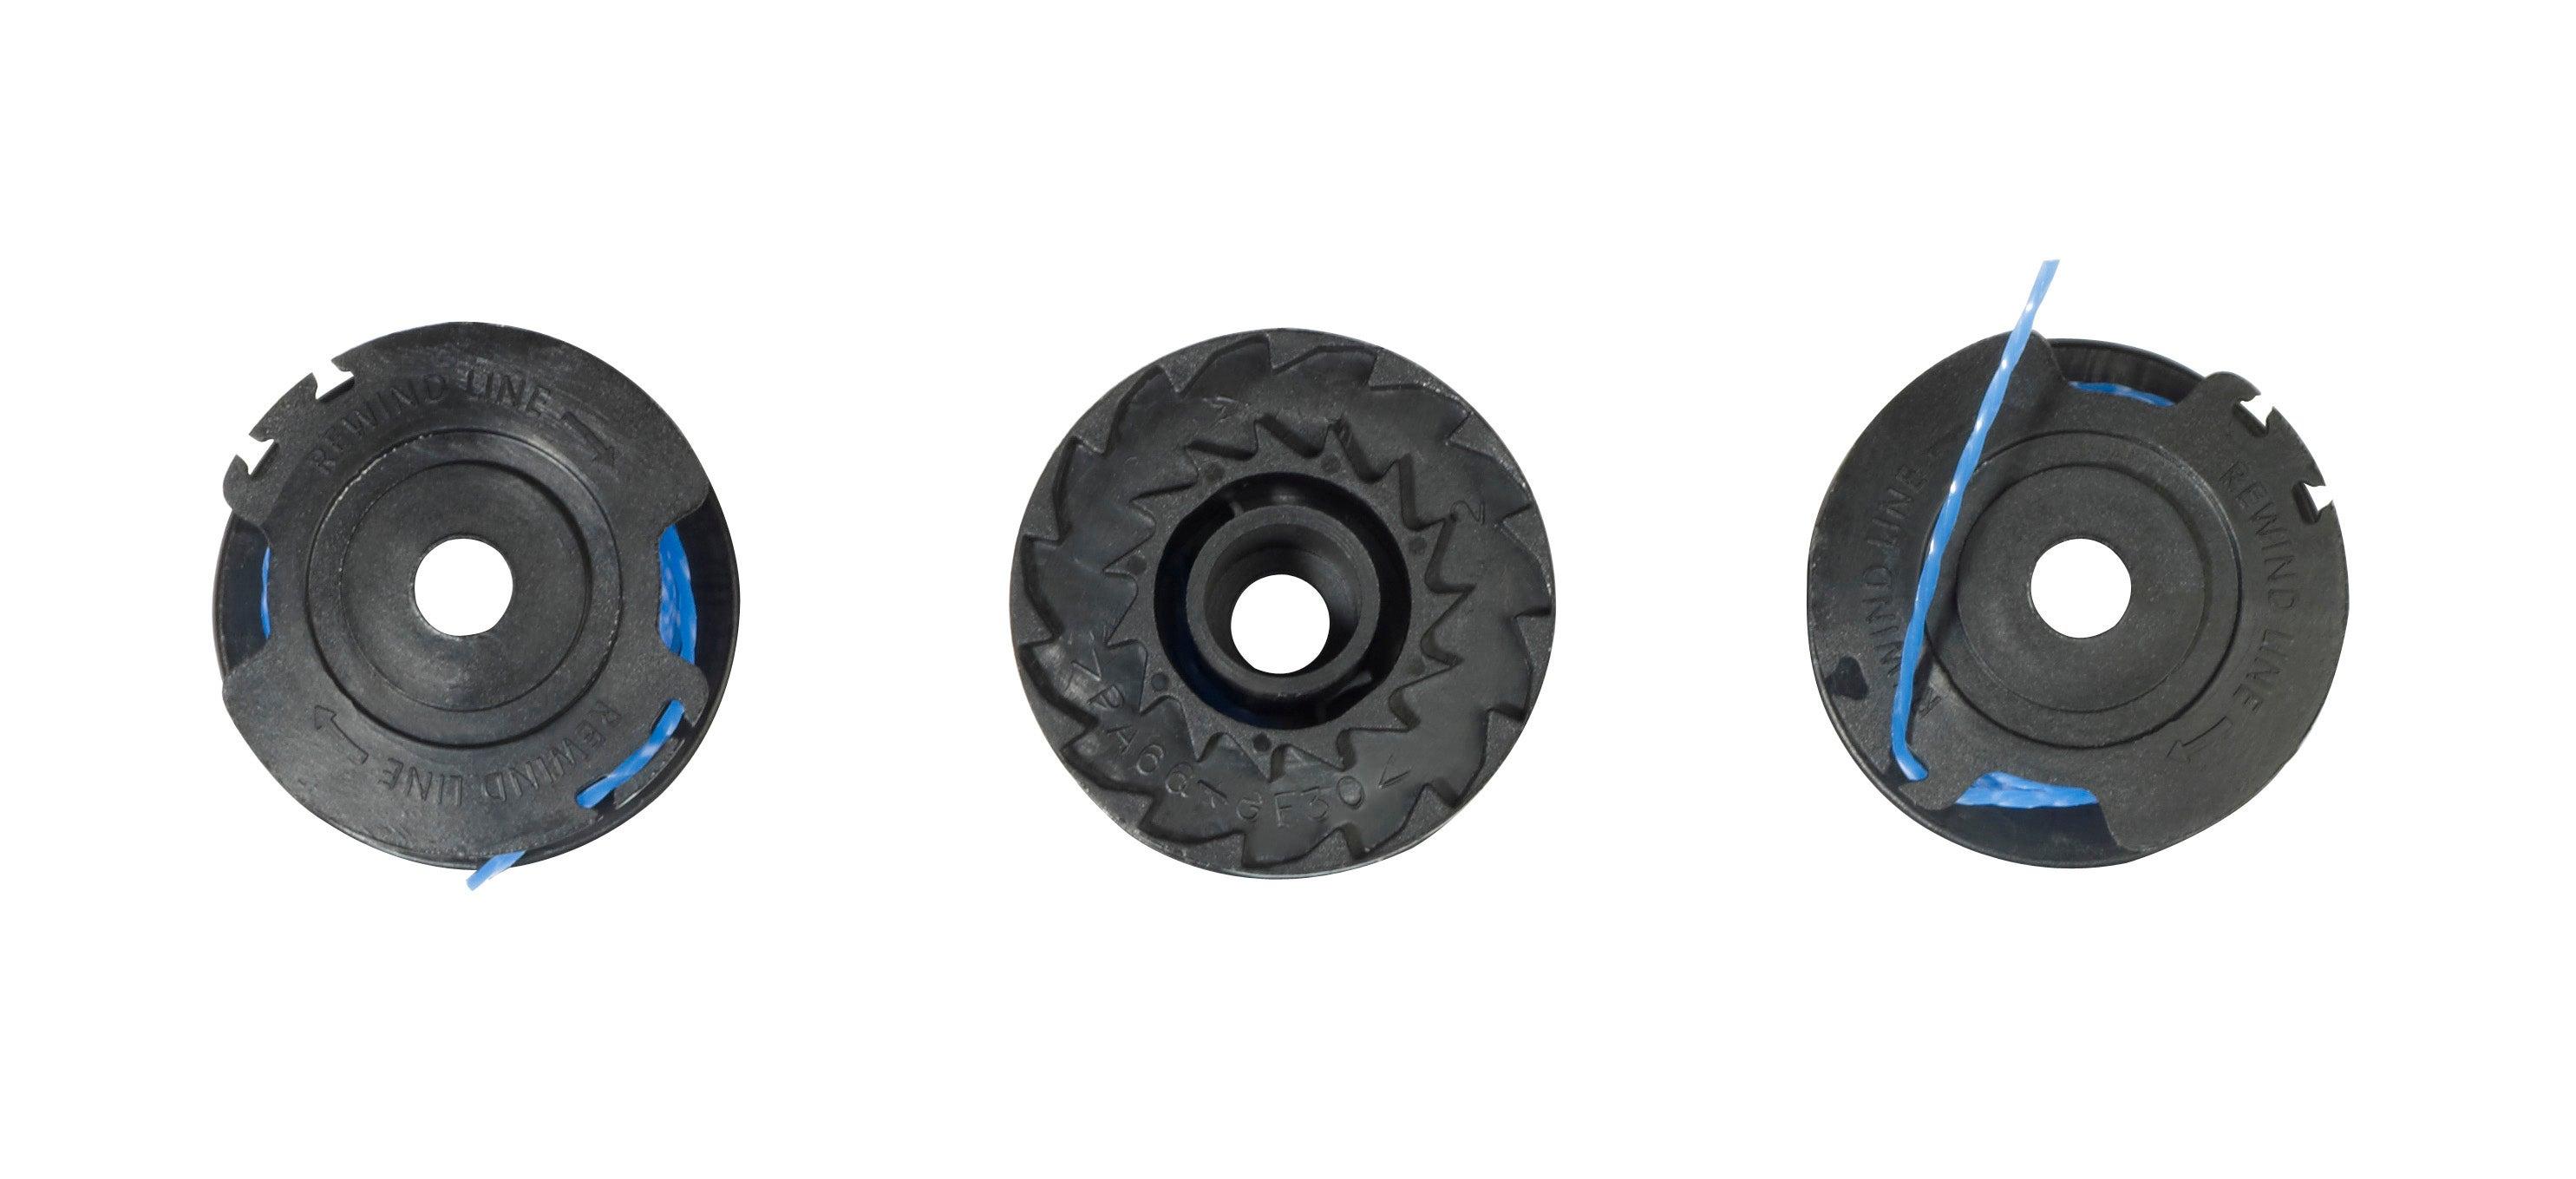 Ryobi 1.6 mm Bobine de rechange et bouchon pour rotofil One RAC124 RLT1830LI OLT1831